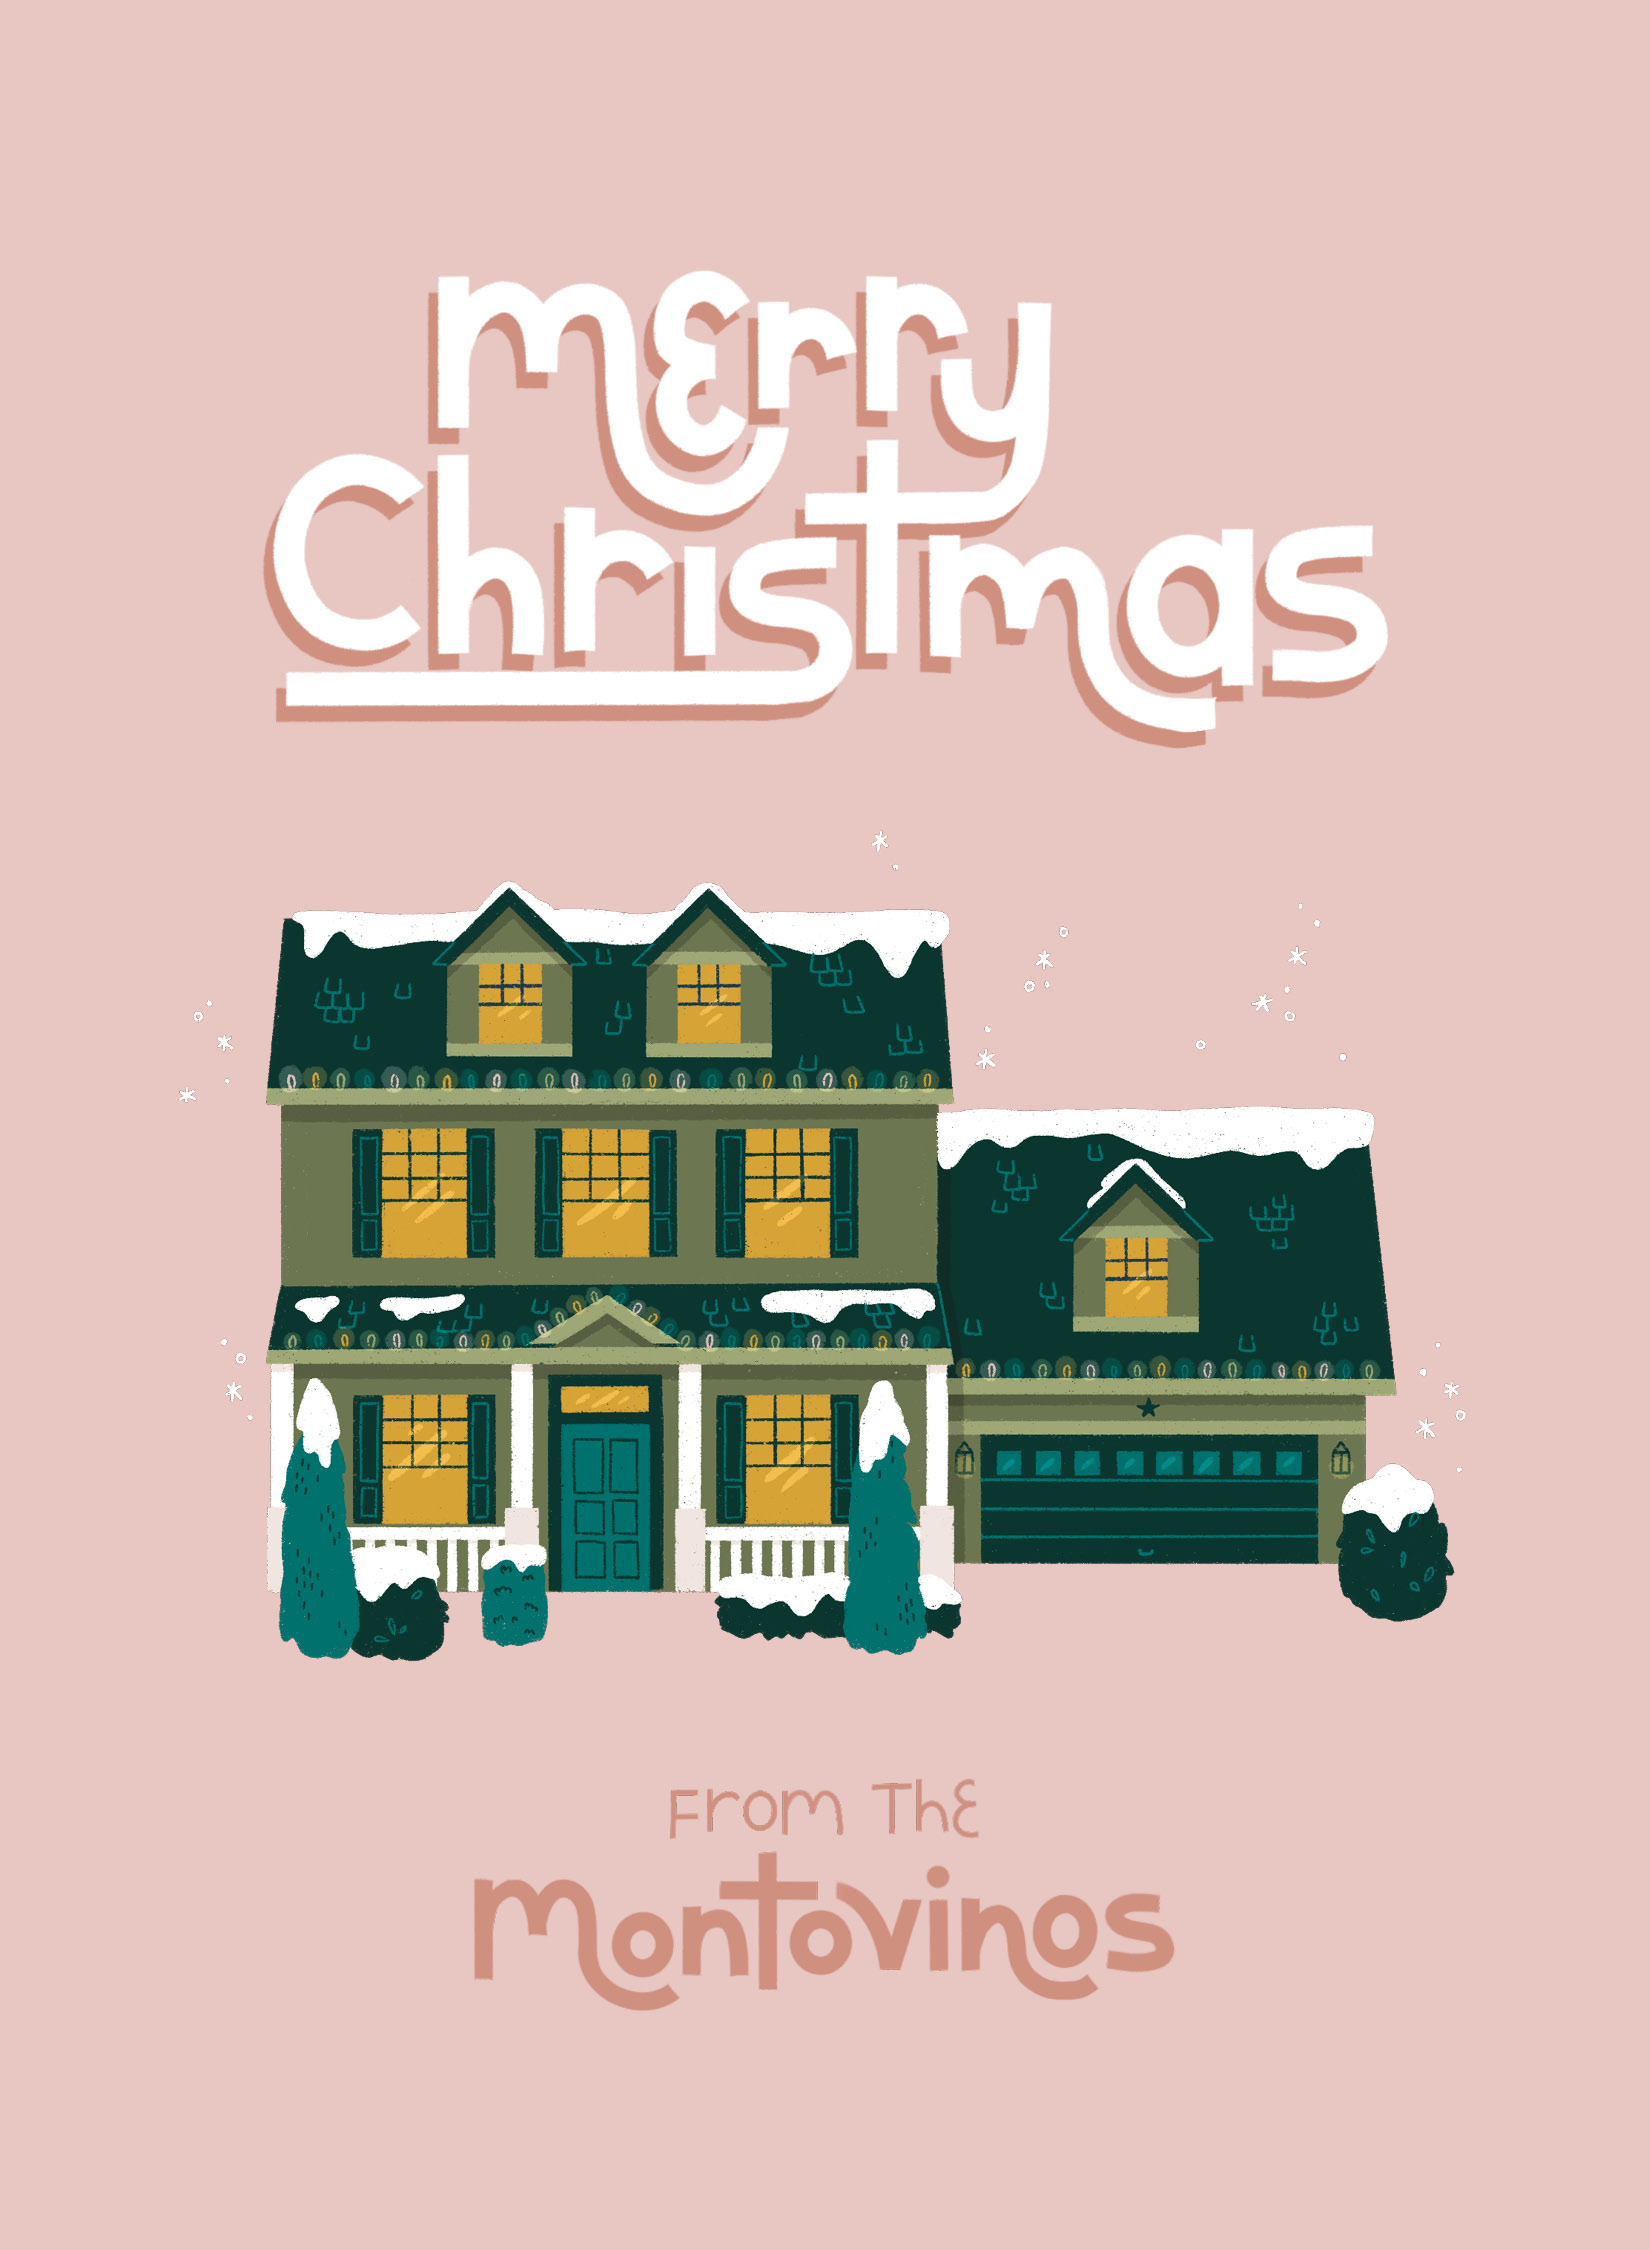 Holiday Cards - Montovinos